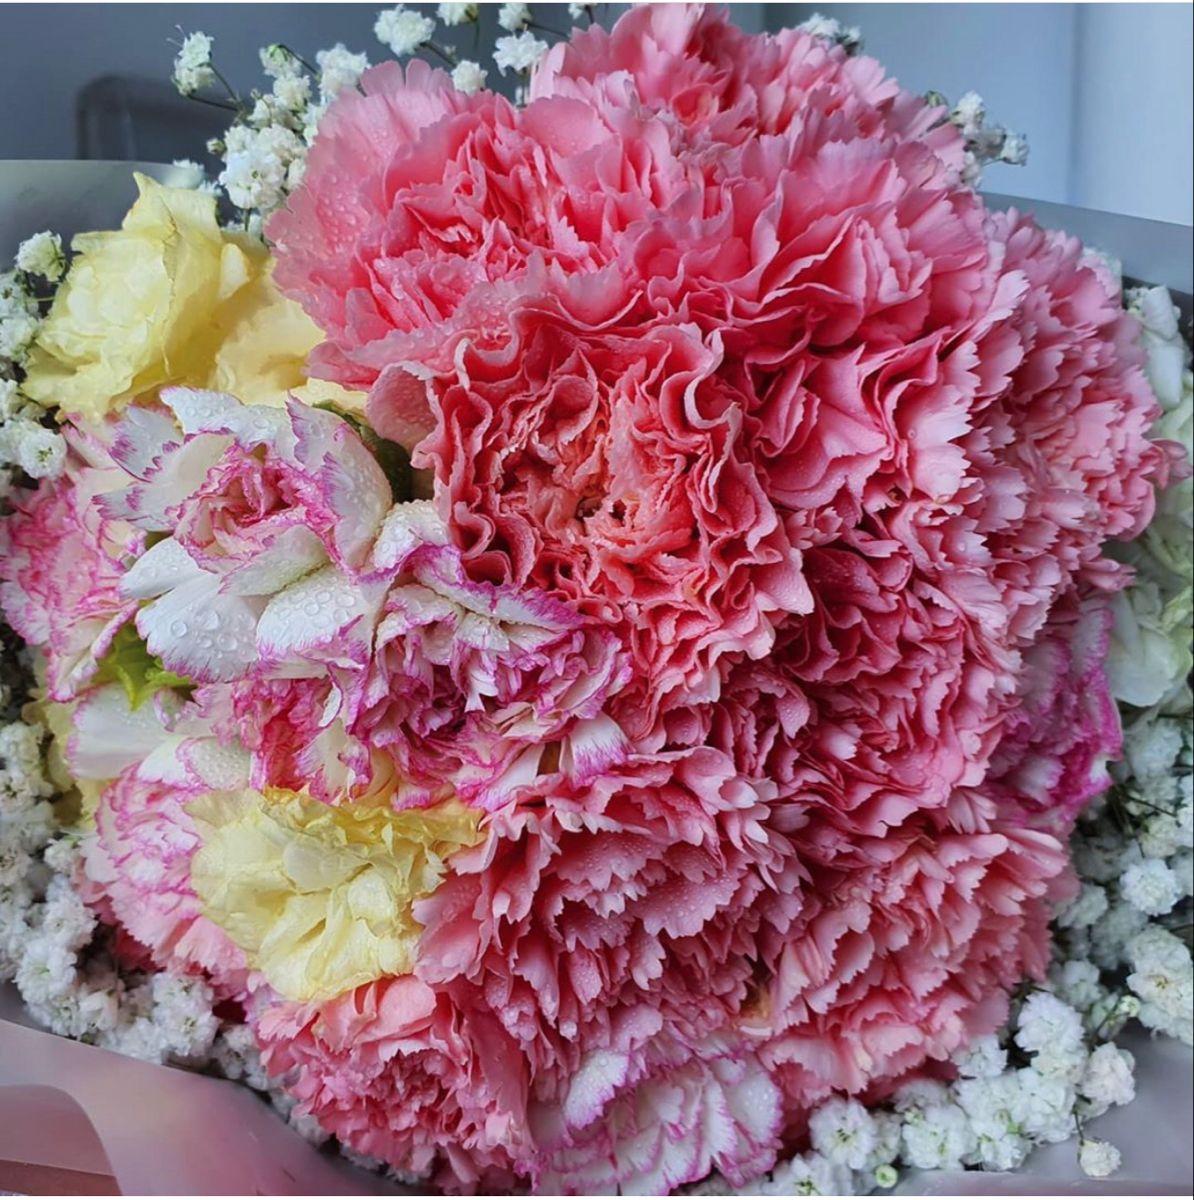 Pink Carnation Flowers Carnation Order Flowers Online Wedding Flowers Pink Carnations Carnation Flower Online Wedding Flowers